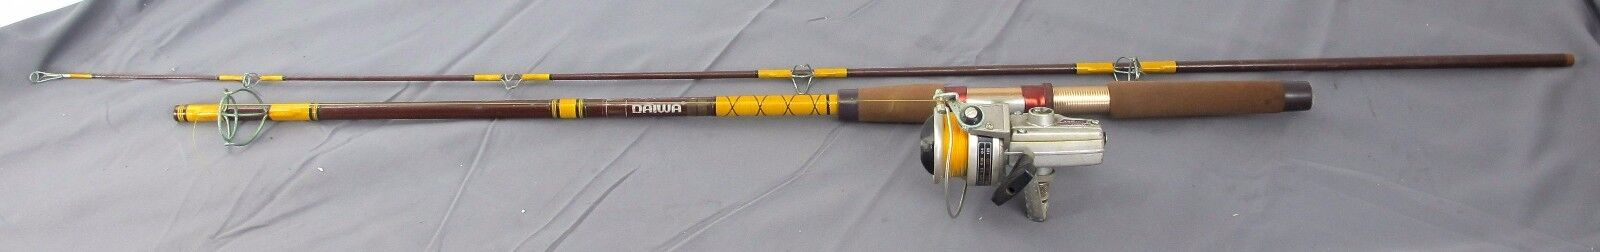 Daiwa 1500C Hi-Speed Spinning Reel Gear Ratio 1 3.7 &  6'6  2pc Fishing Rod Combo  fashionable